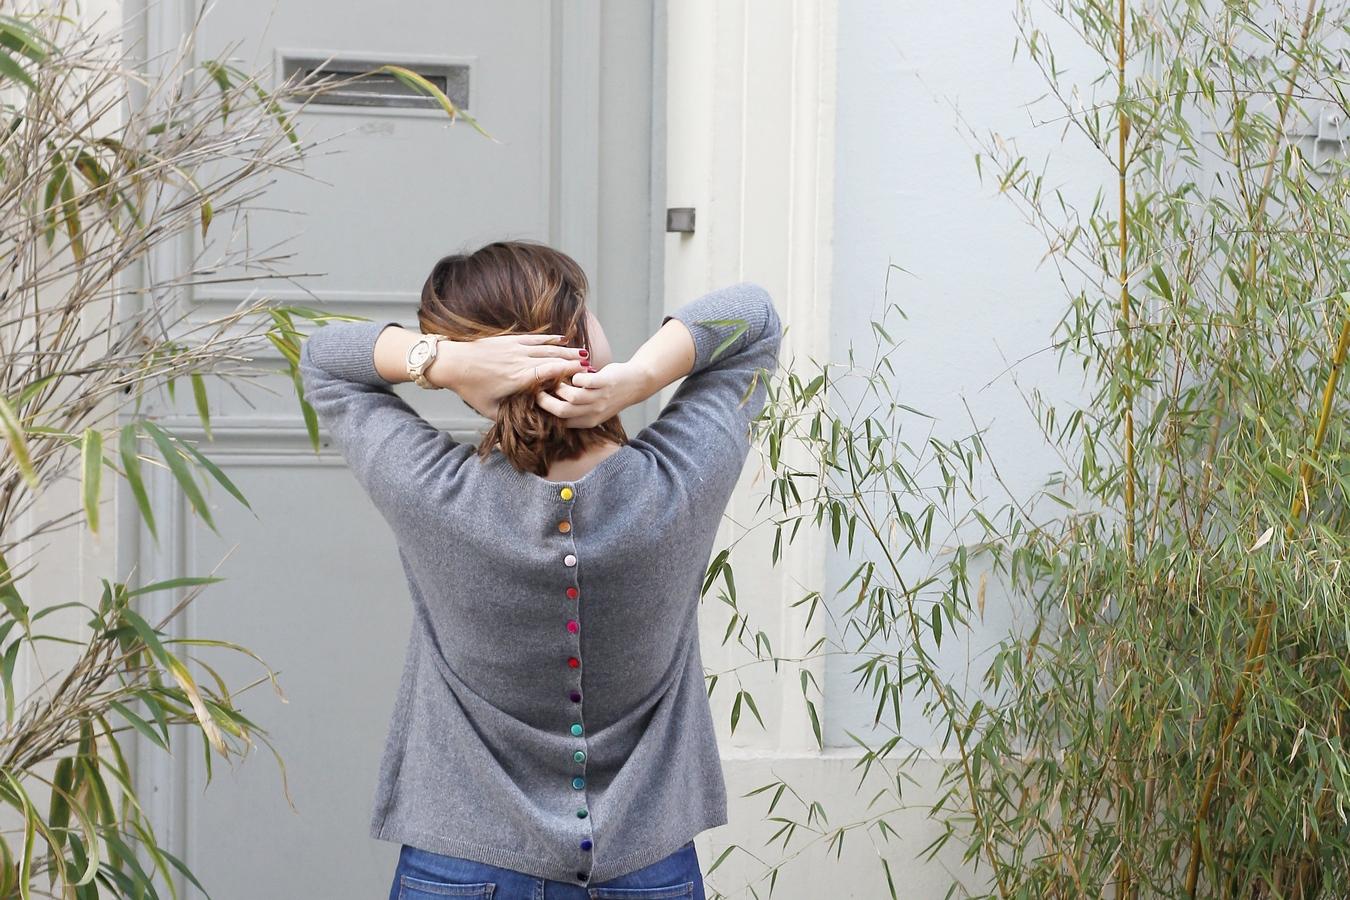 Blog mode femme Paris - Du style, Madame - streetstyle - estheme cachemire